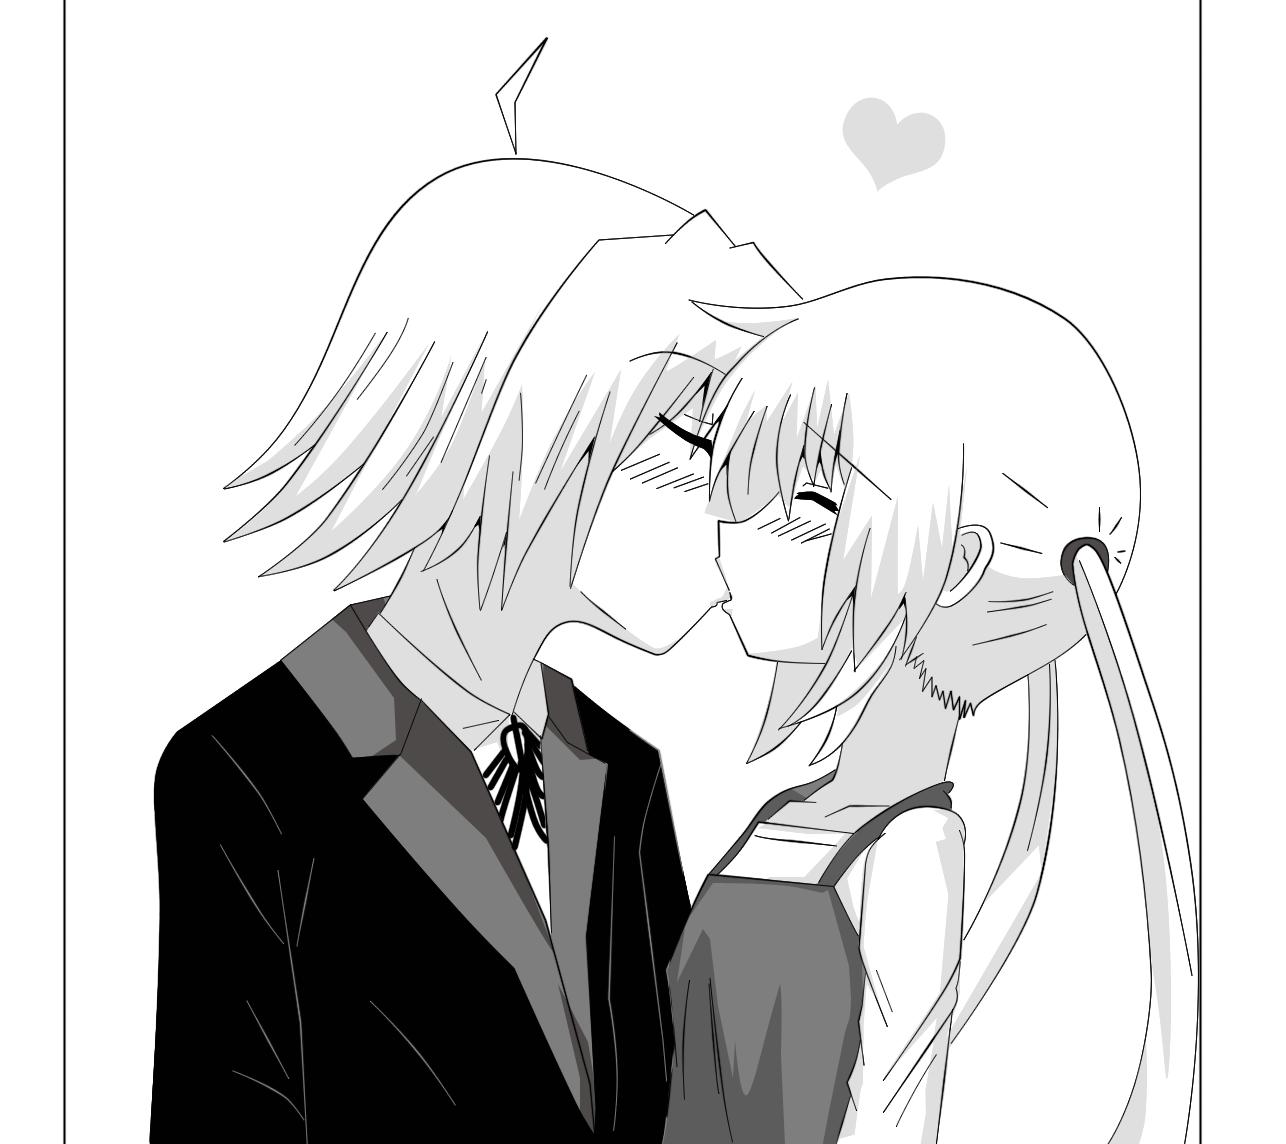 hayate and nagi relationship